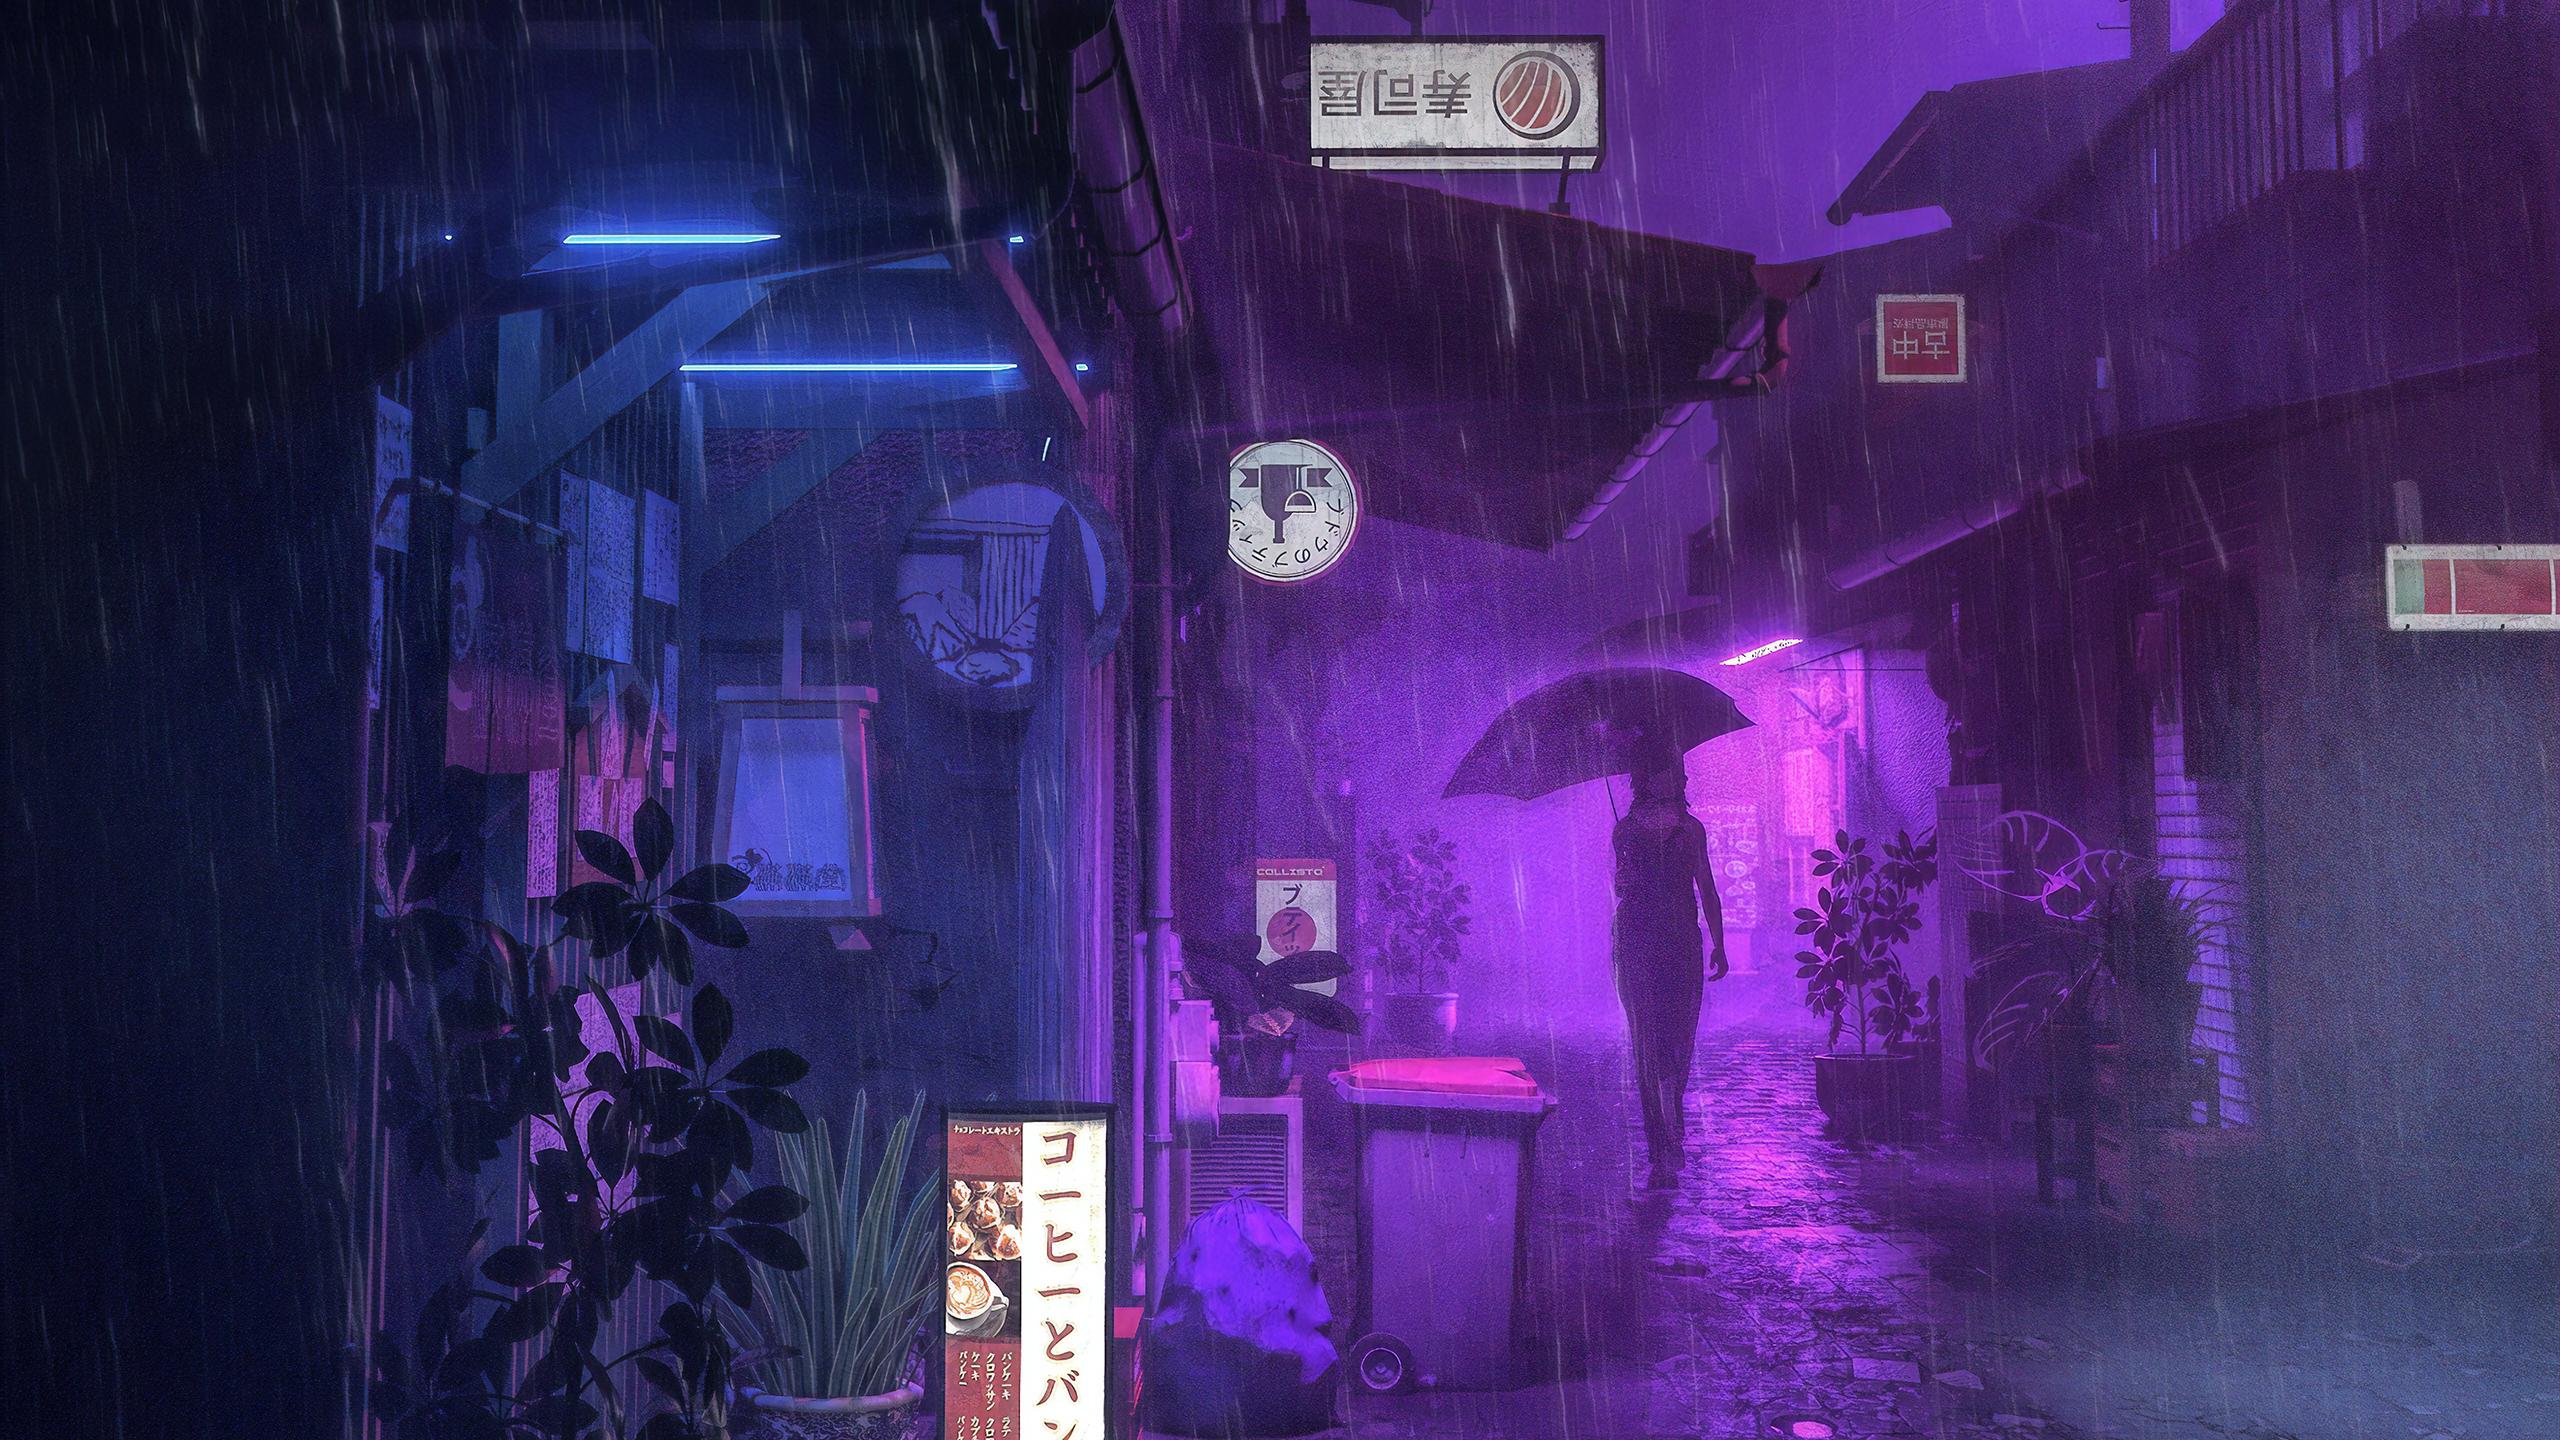 Village Street Neon Girl Umbrella HD Anime 4k Wallpapers